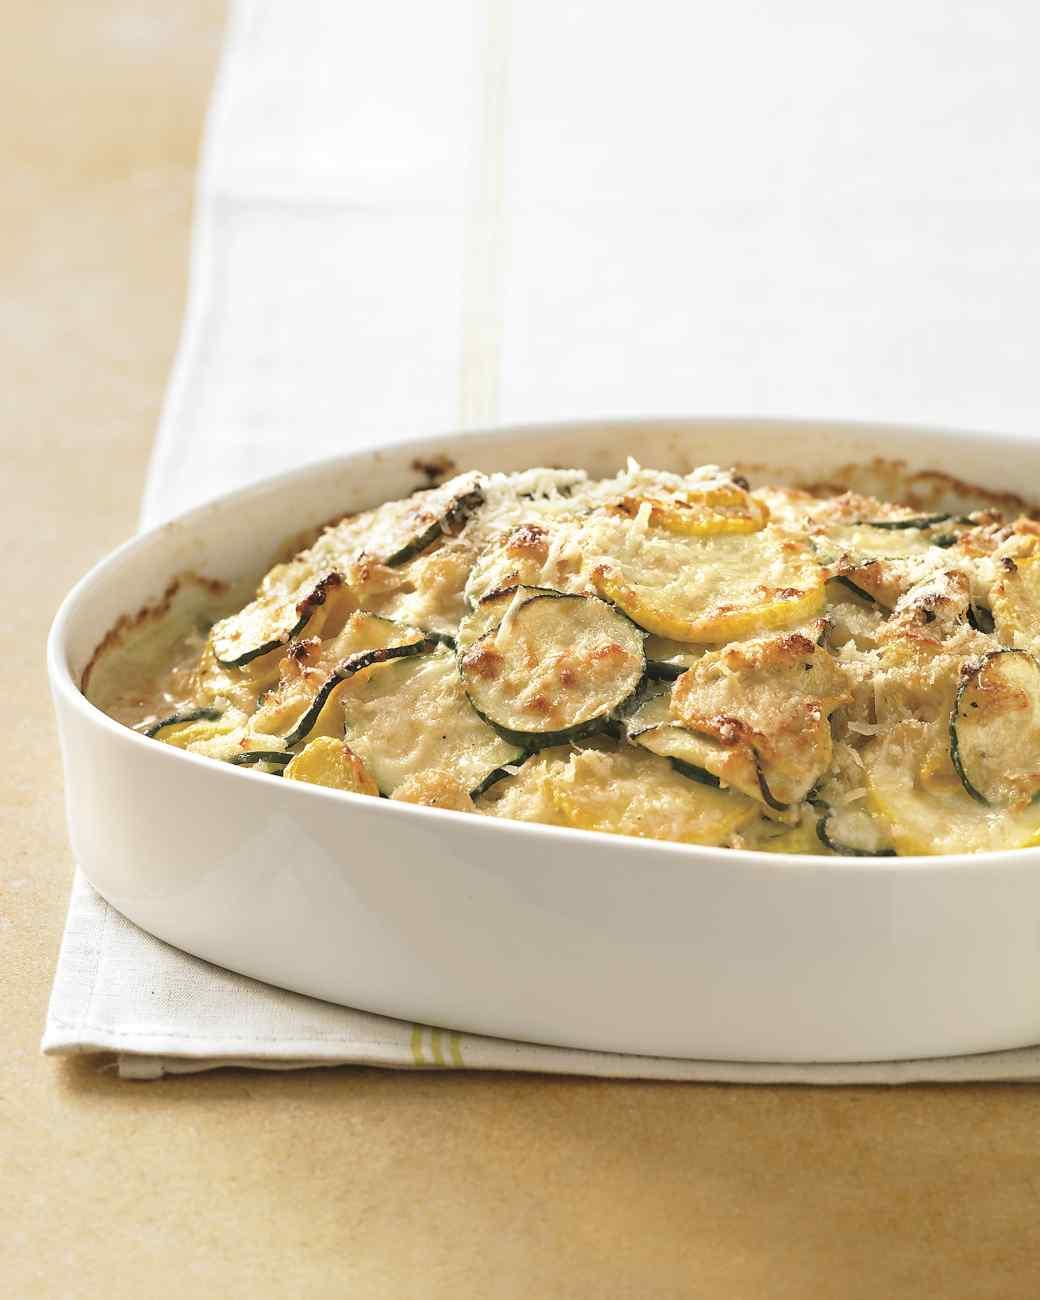 Zucchini and Yellow Squash Gratin (Casserole)